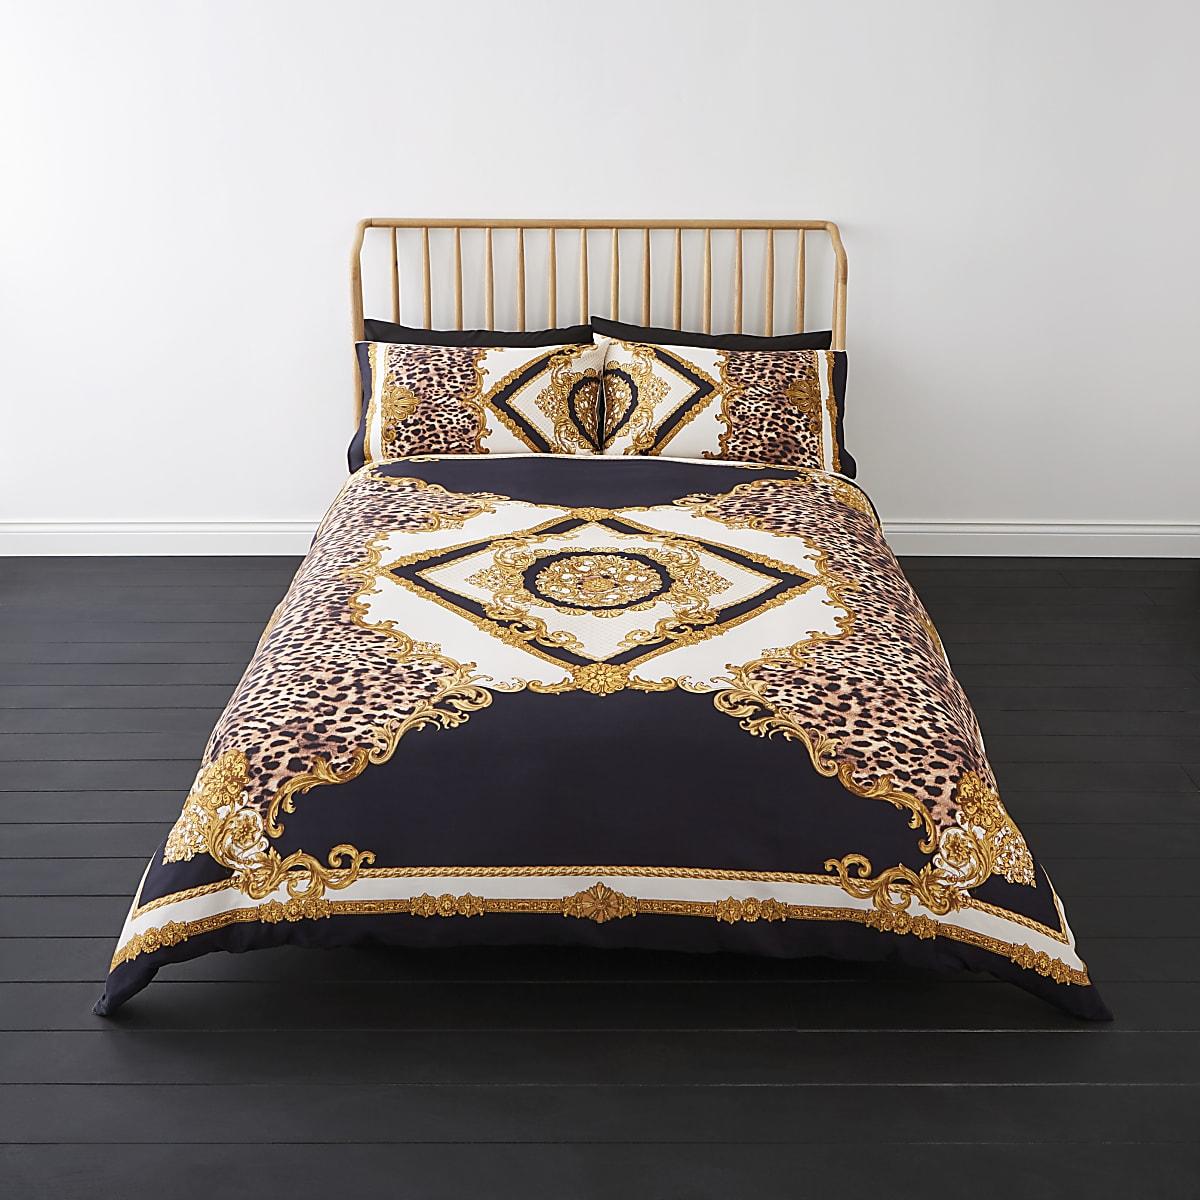 Marineblauwe superkingsize dekbedset met luipaard- en barokprint